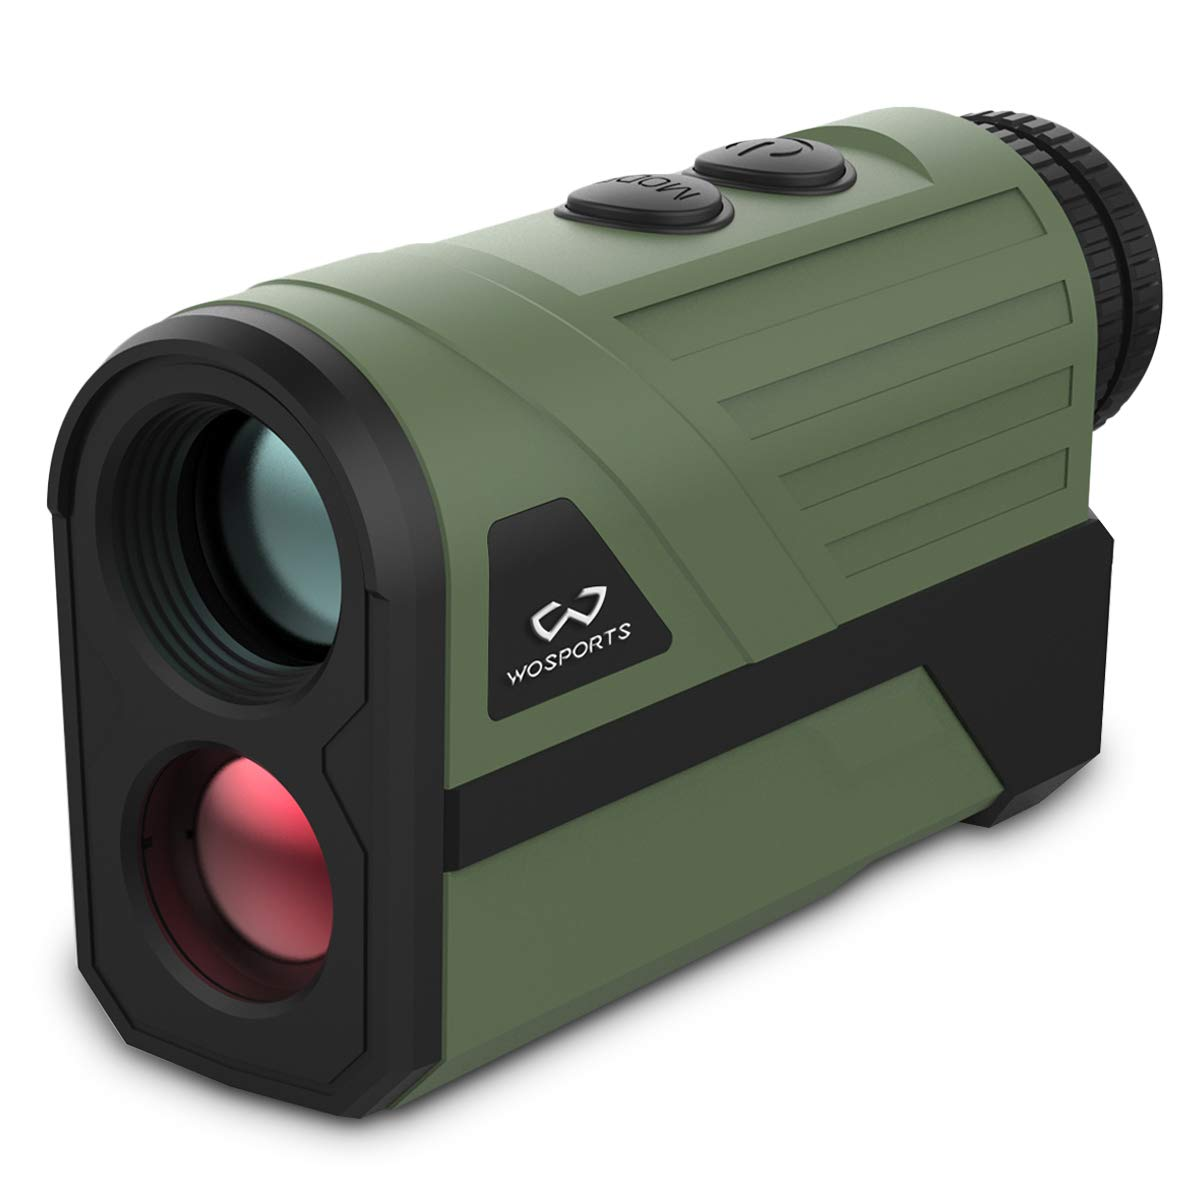 WOSPORTS 1000 Yards Hunting Rangefinder Laser Rangefinder Archery Bow Hunting Ranging with Flagpole Lock Ranging Scan Speed